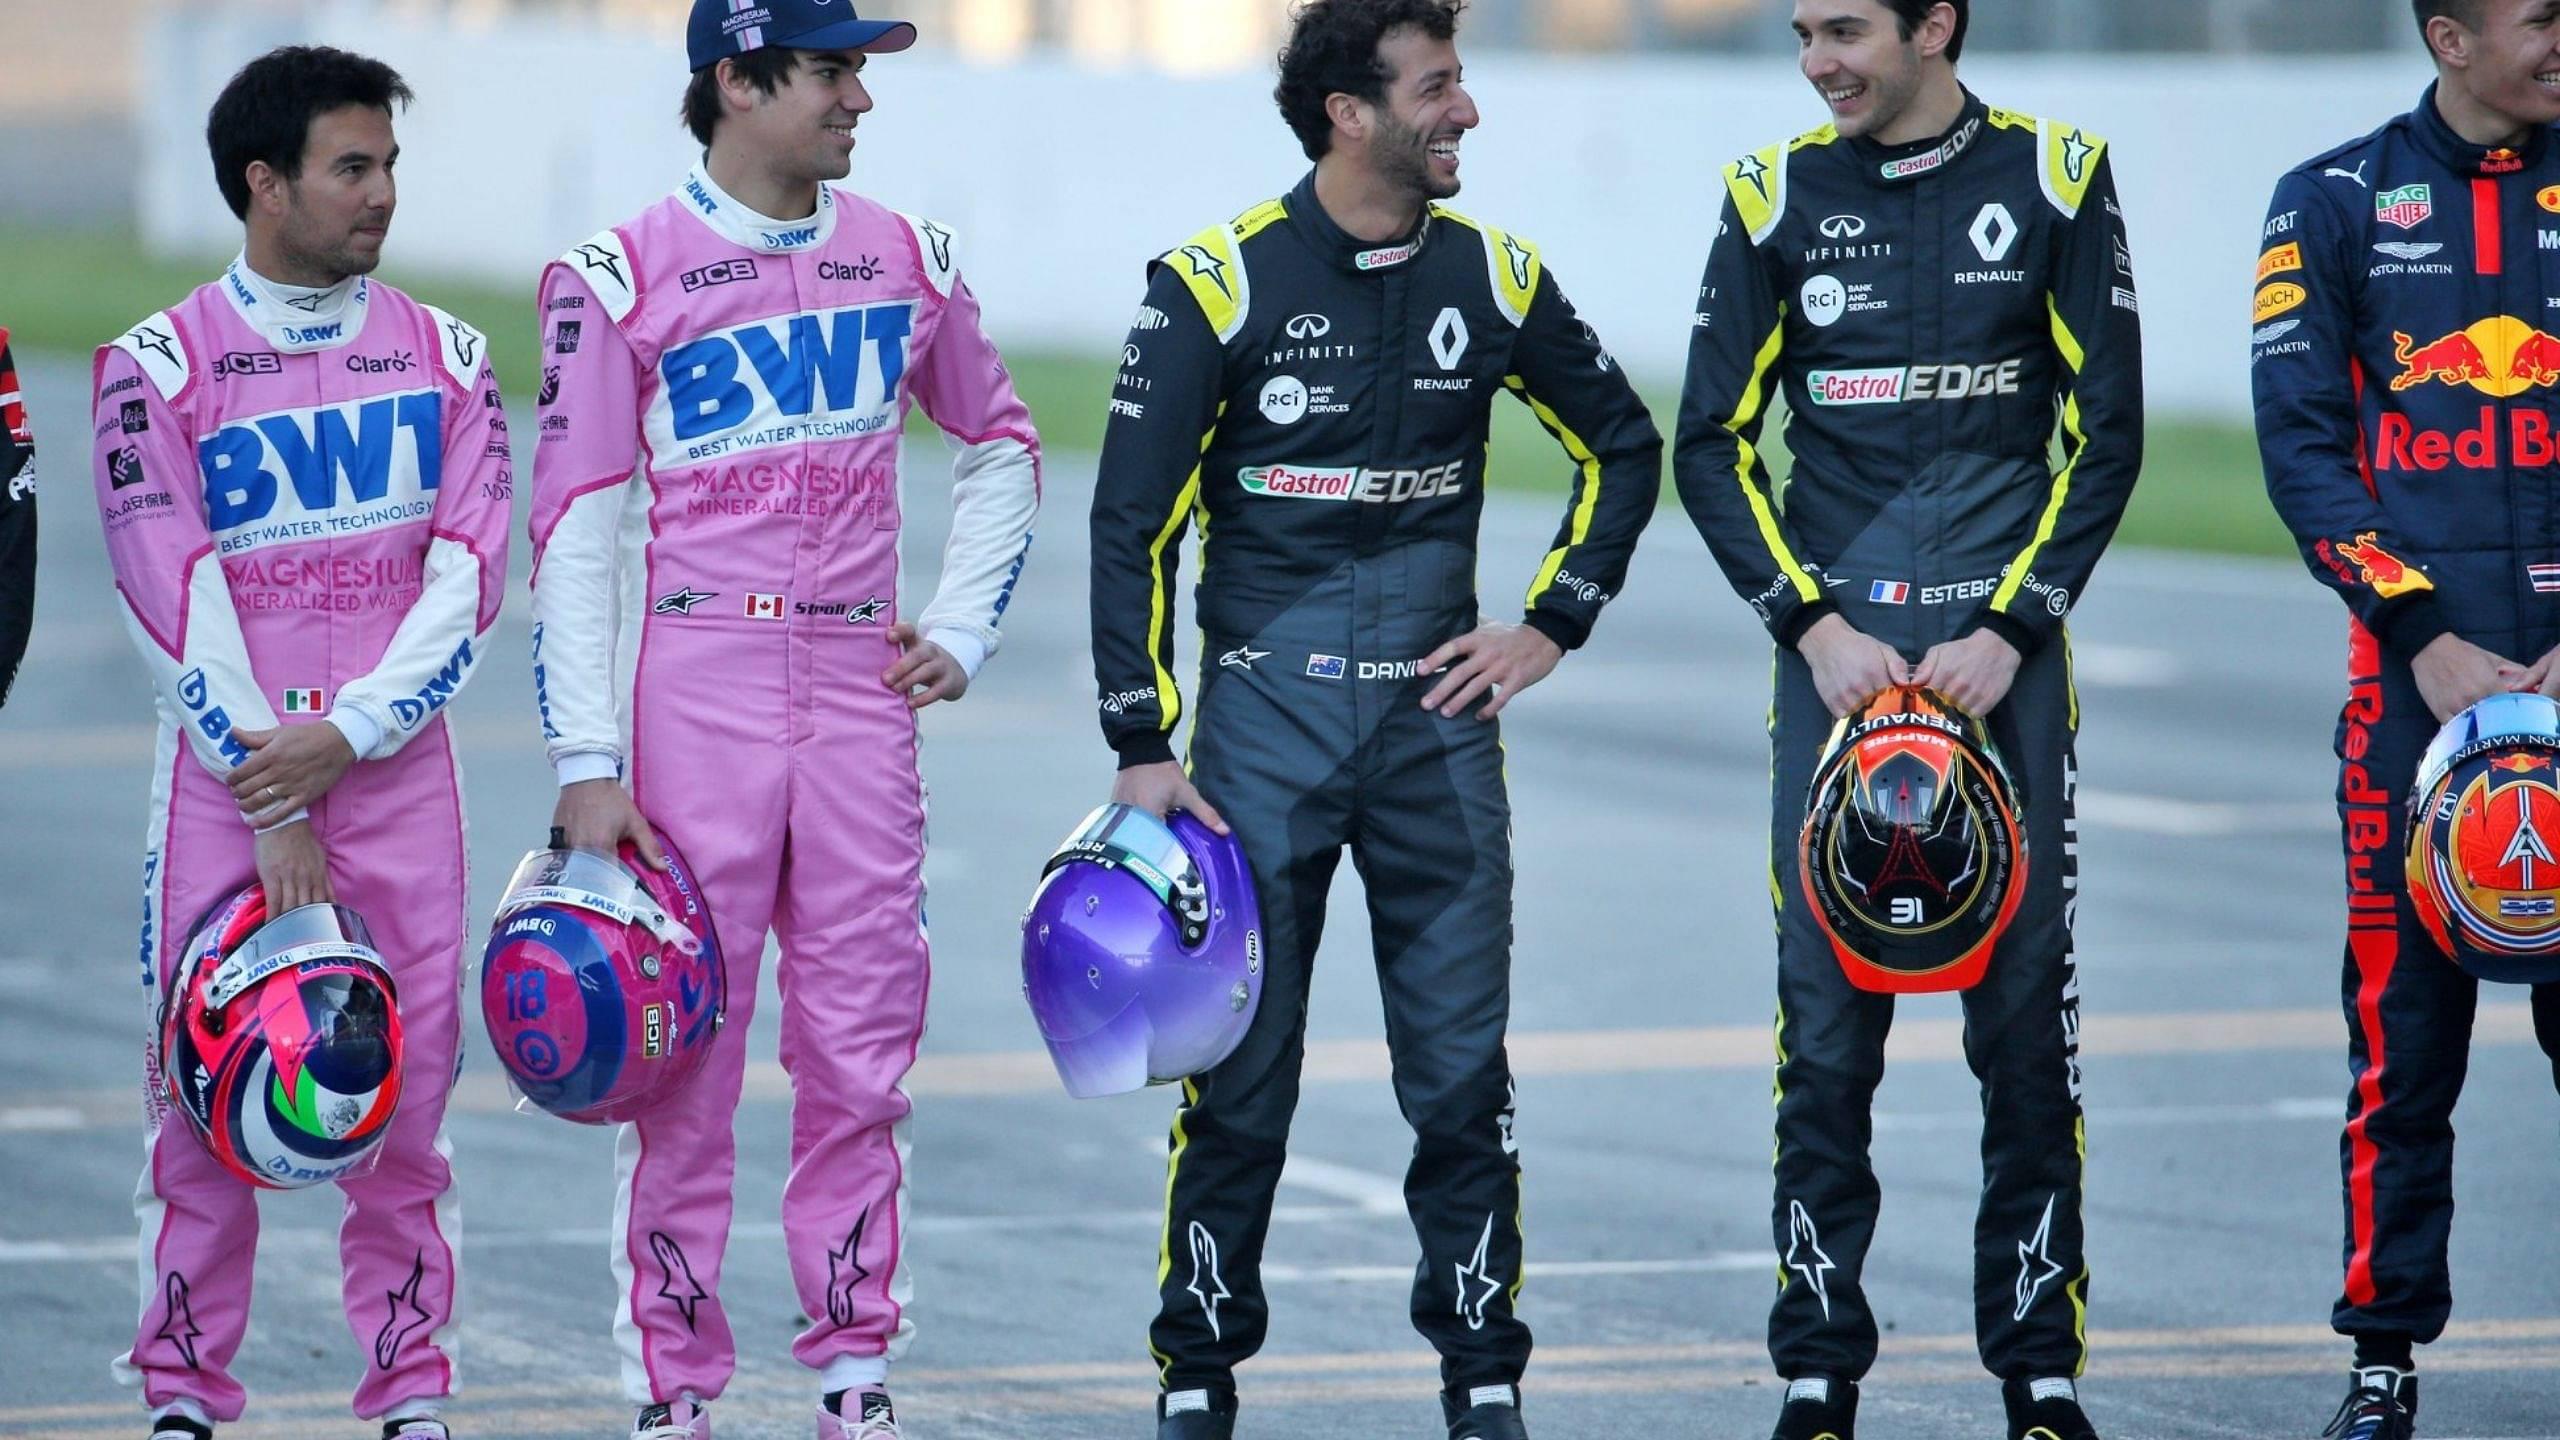 """Get him into turn one"" - Renault duo Daniel Ricciardo and Esteban Ocon ready to challenge Sergio Perez at Bahrain Grand Prix"